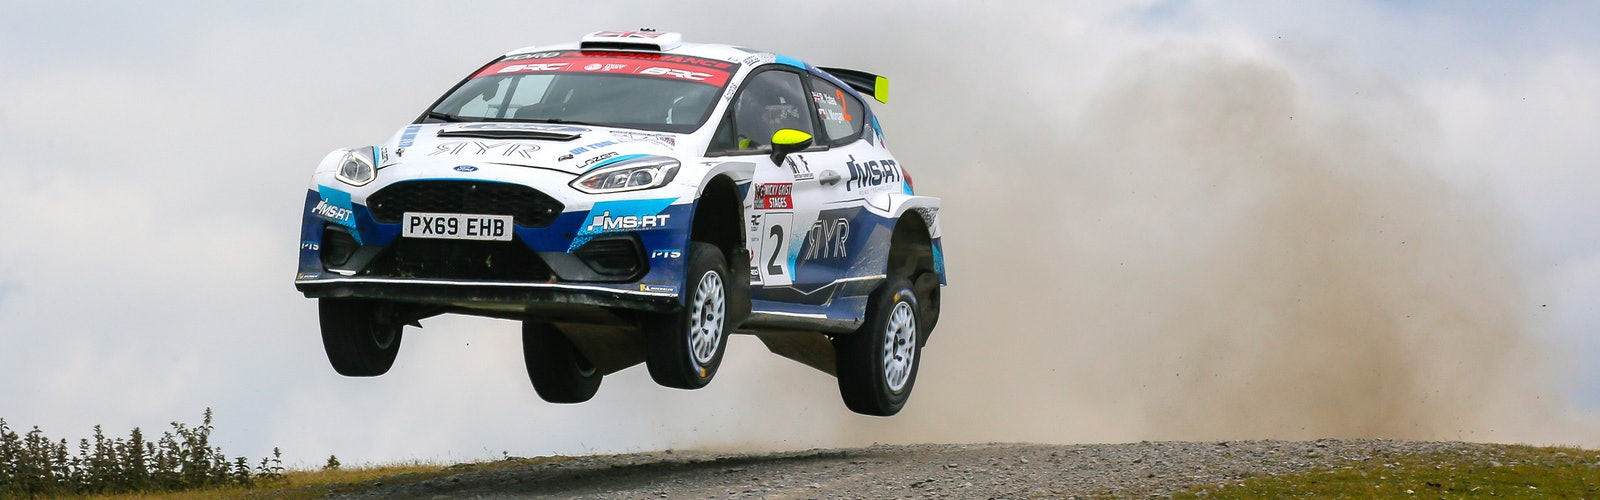 Rhys Yates / James Morgan – Ford Fiesta Rally2